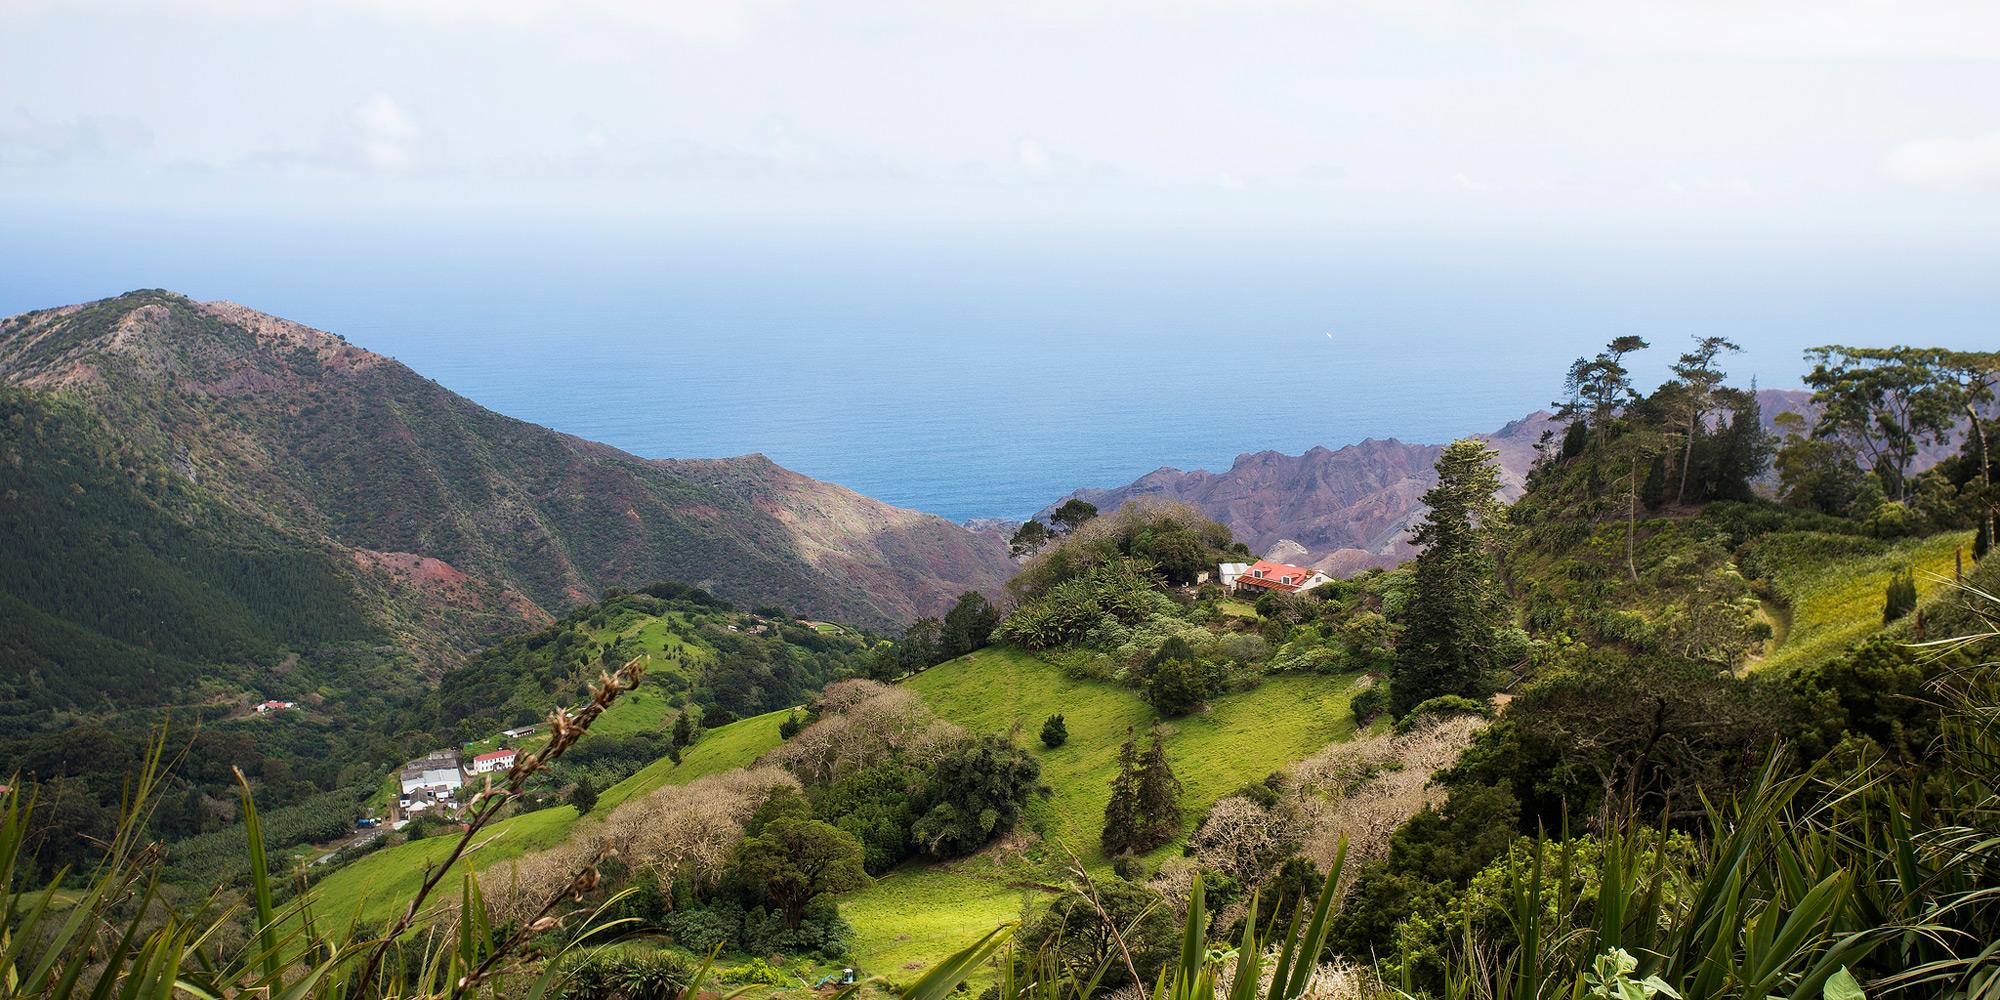 Varied landscape of St. Helena island